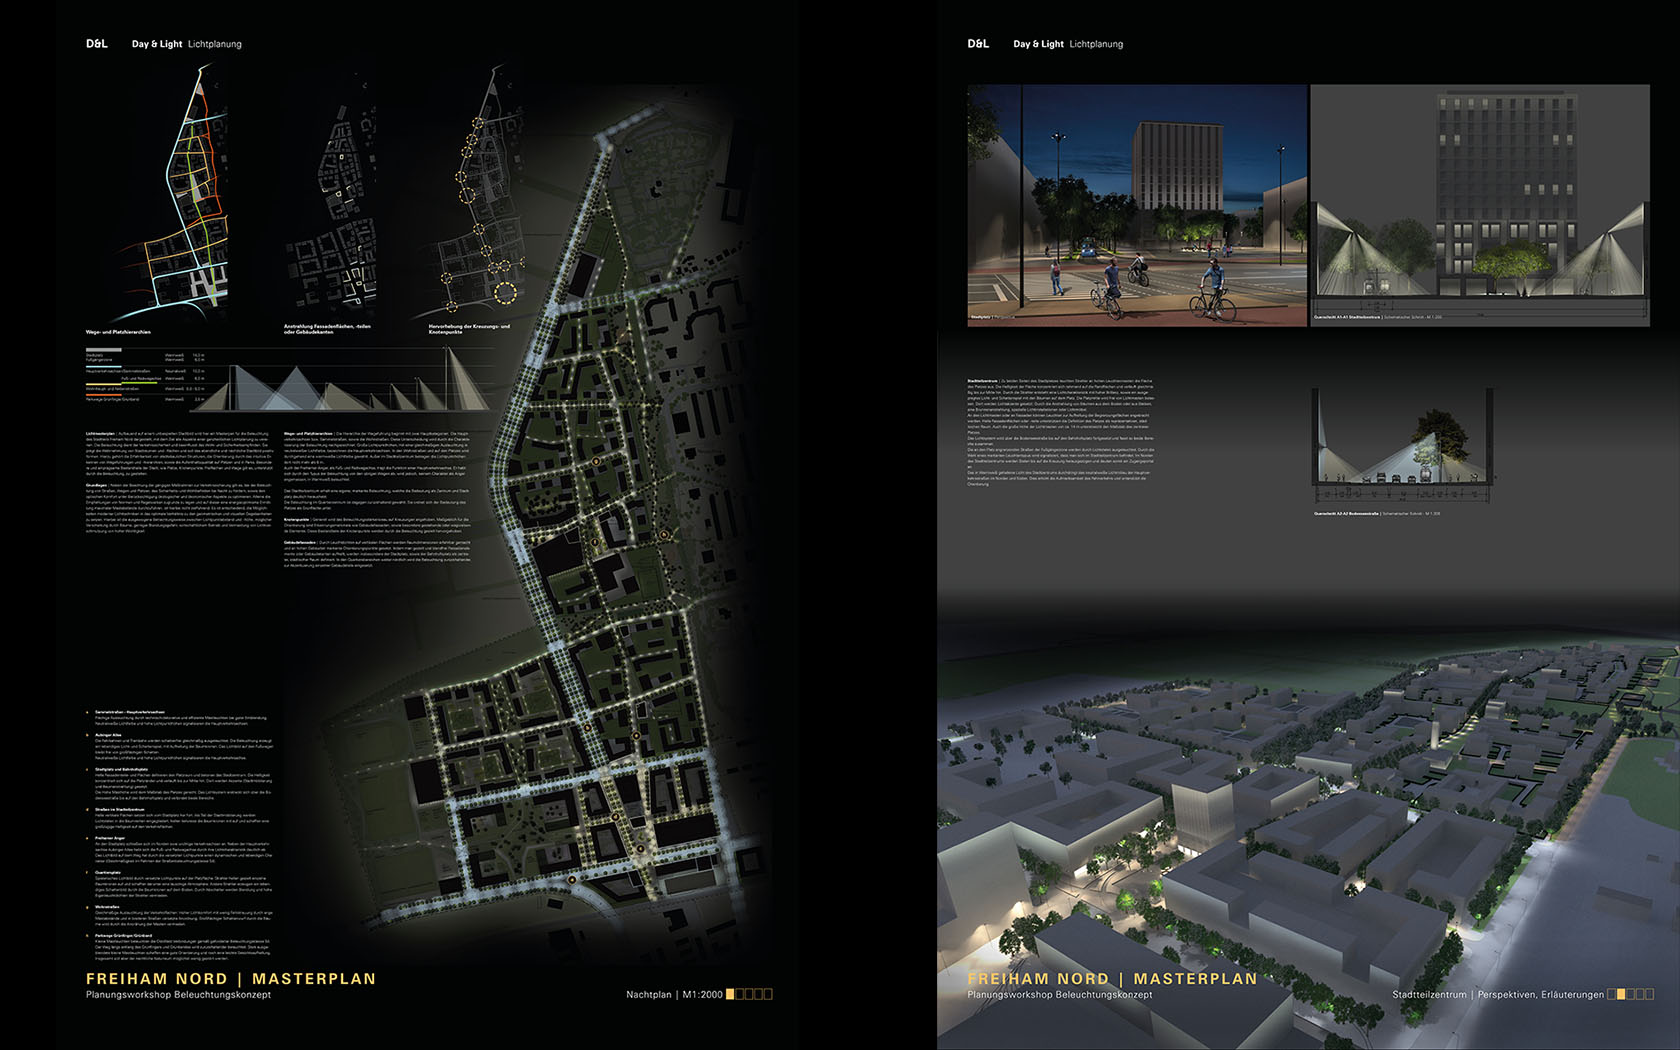 FNM_Planlayout-1-2_1680